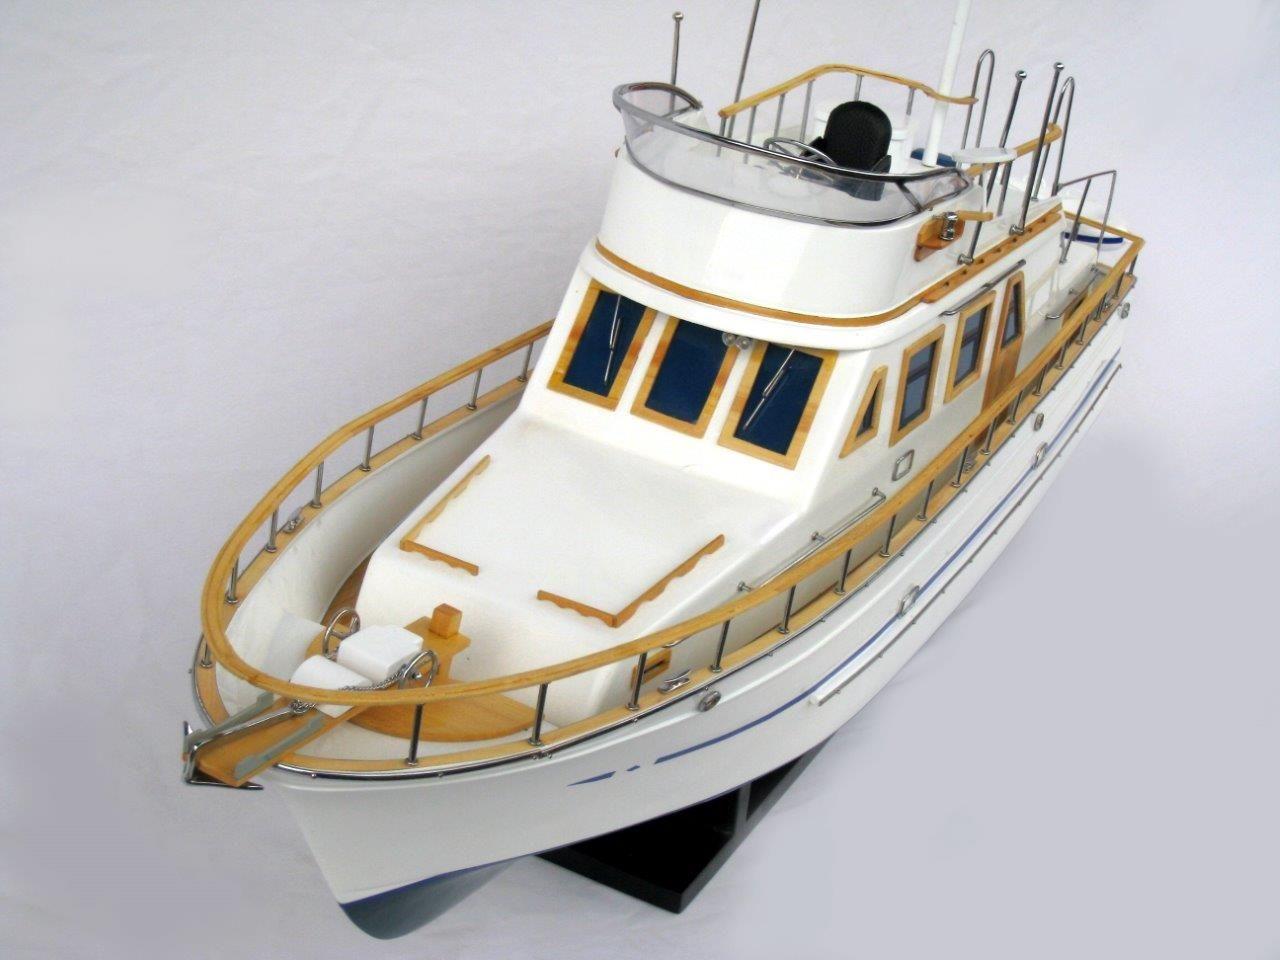 2092-12428-Reinee-Roo-Model-Ship